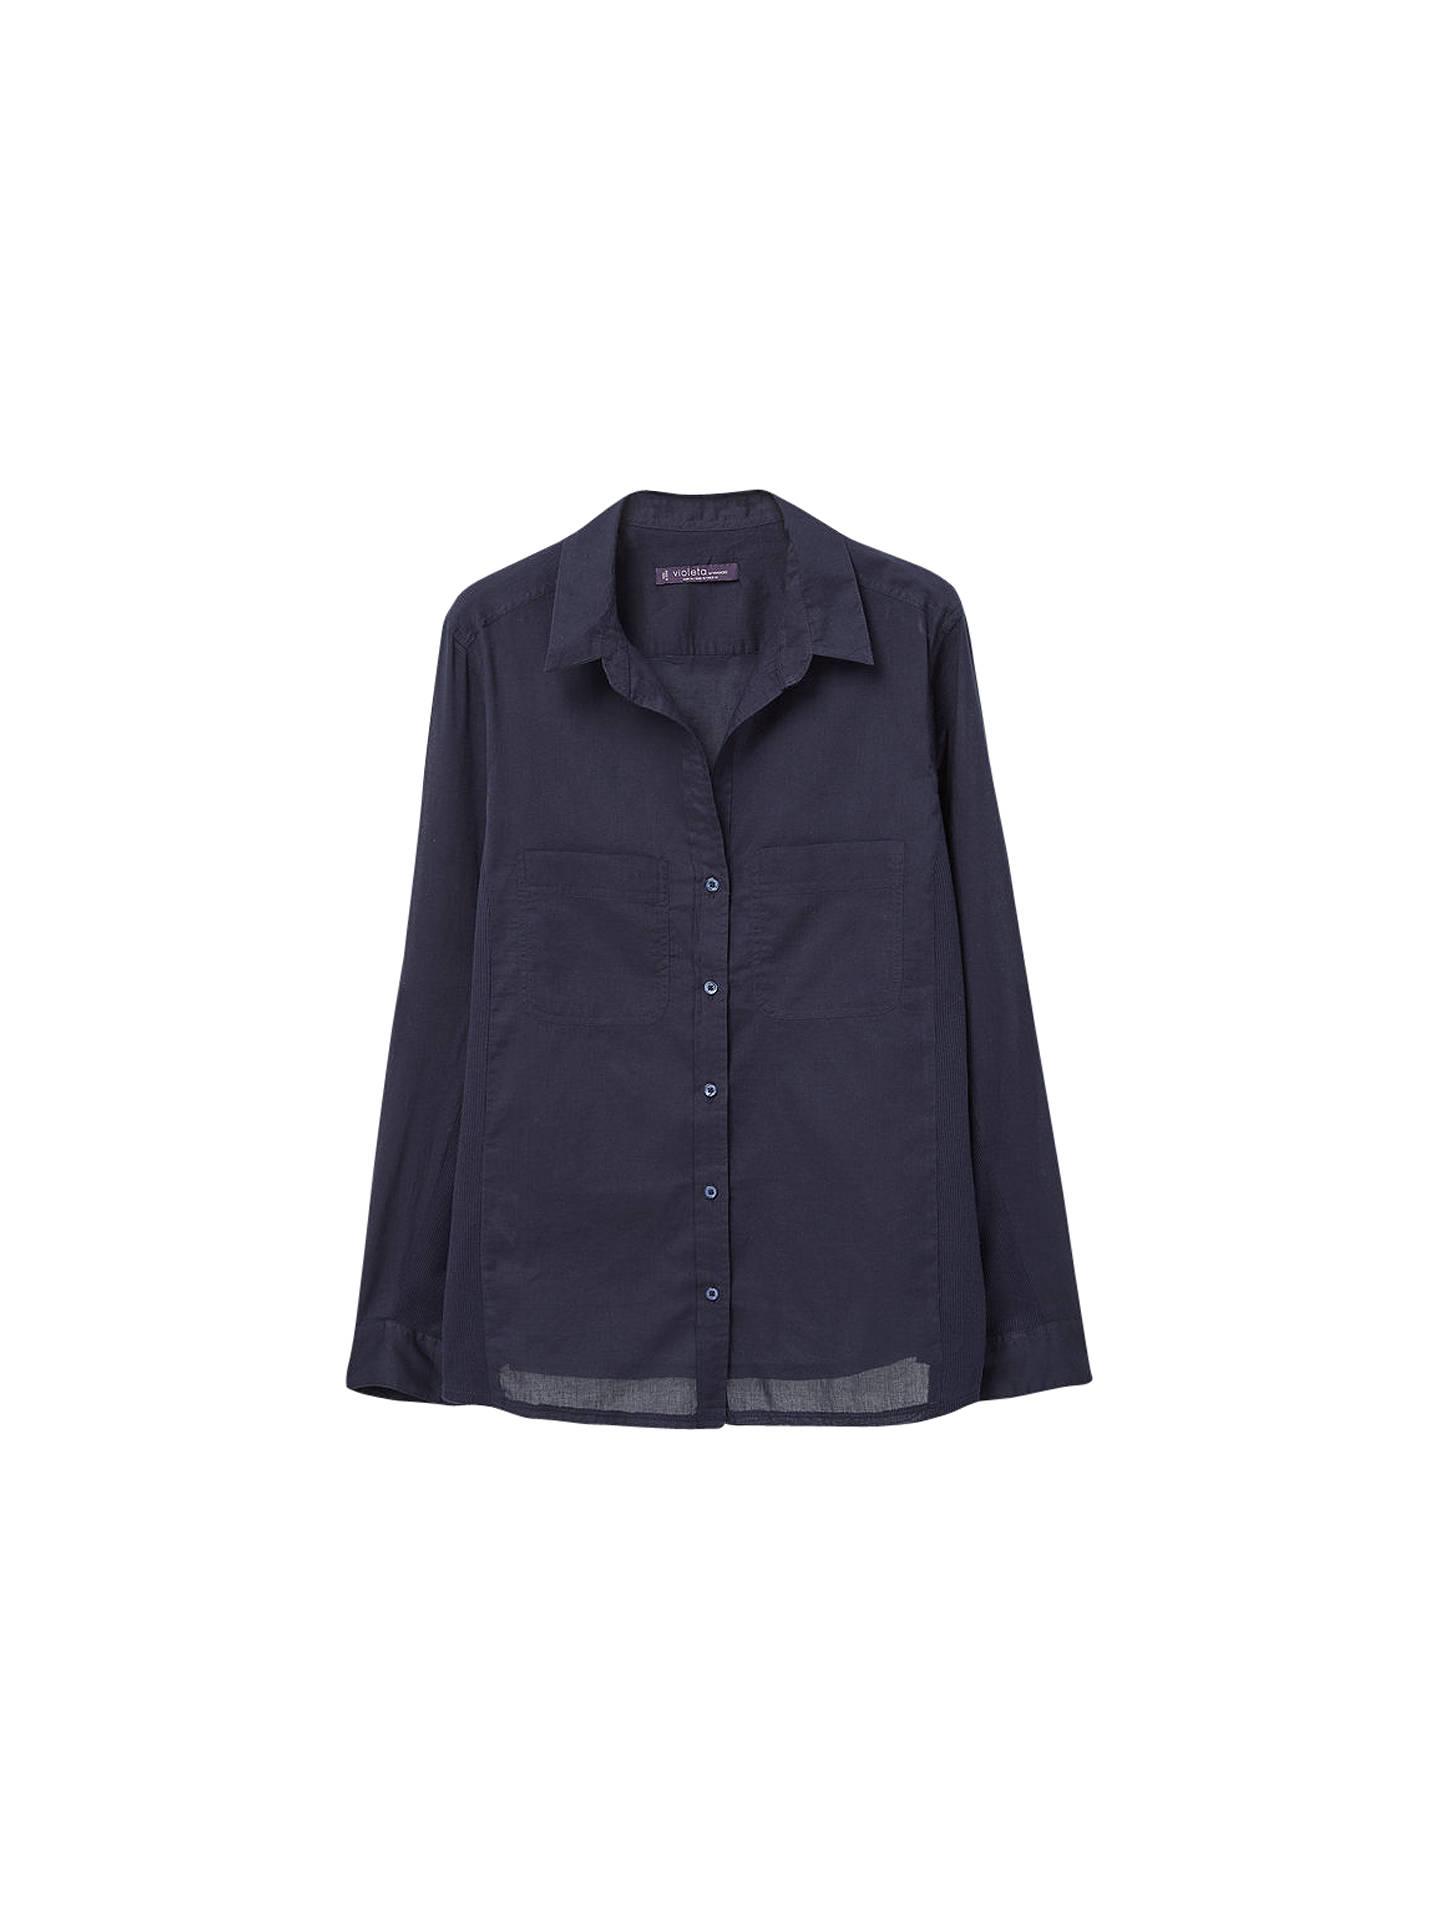 59143236ebd Violeta by Mango Chest Pocket Cotton Shirt at John Lewis   Partners